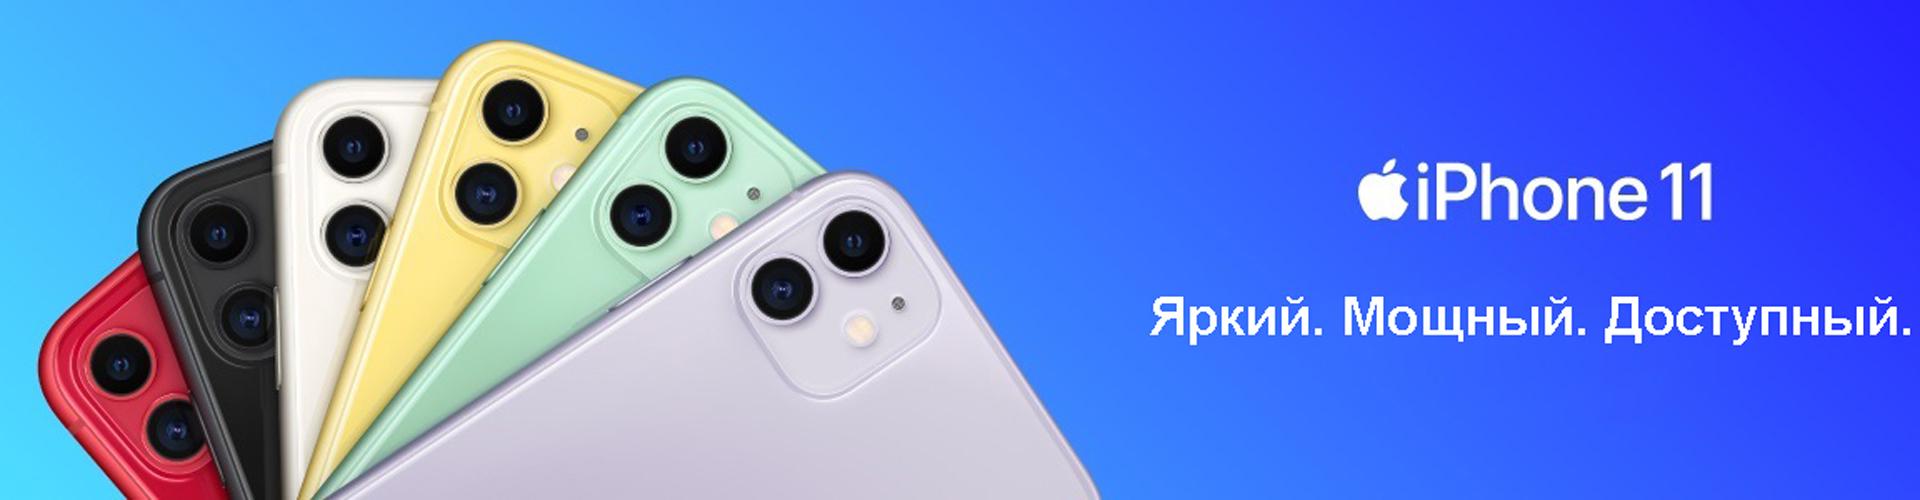 data/banner/iphone_11_banner_1.jpg